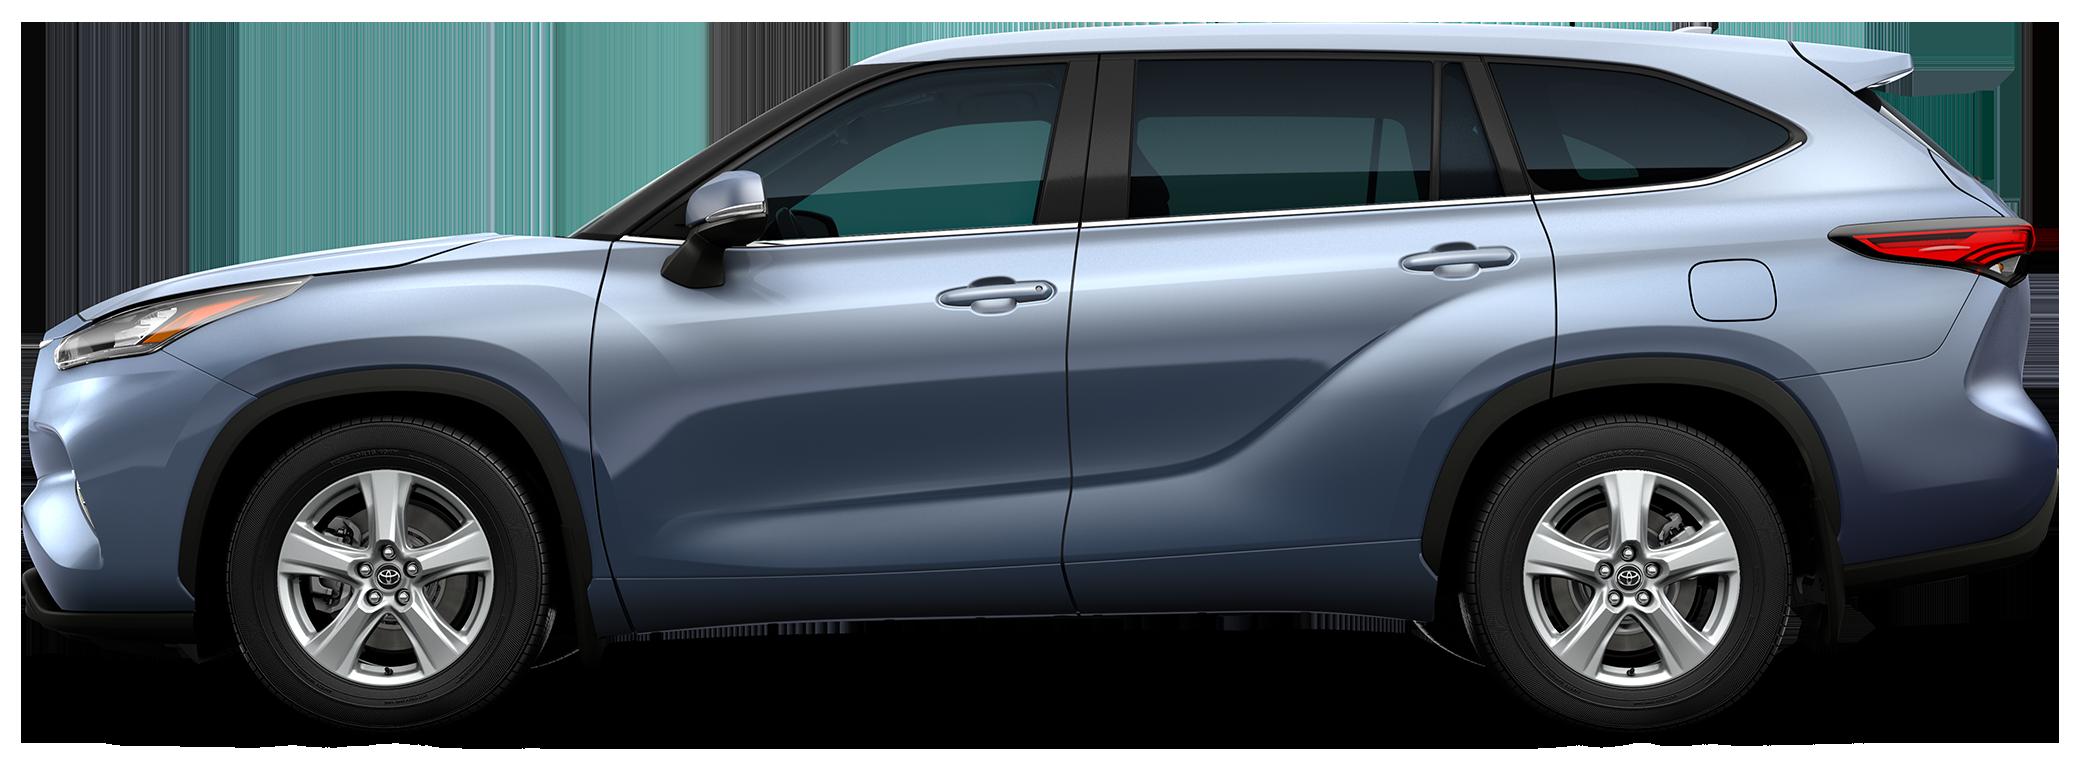 2020 Toyota Highlander SUV L